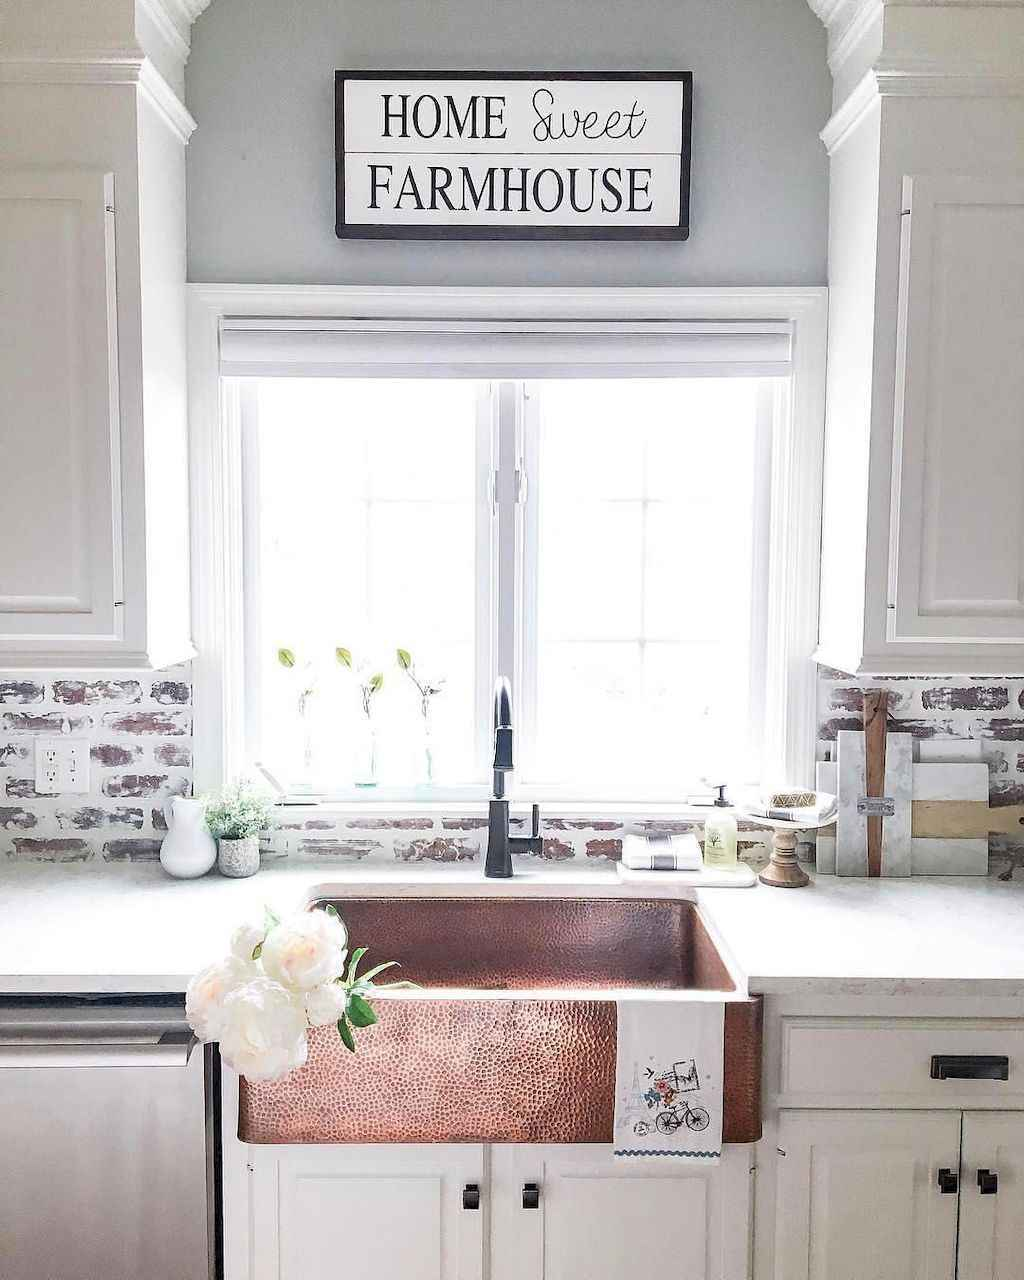 Farmhouse Kitchen Backsplash Ideas: 60 Fancy Farmhouse Kitchen Backsplash Decor Ideas (16